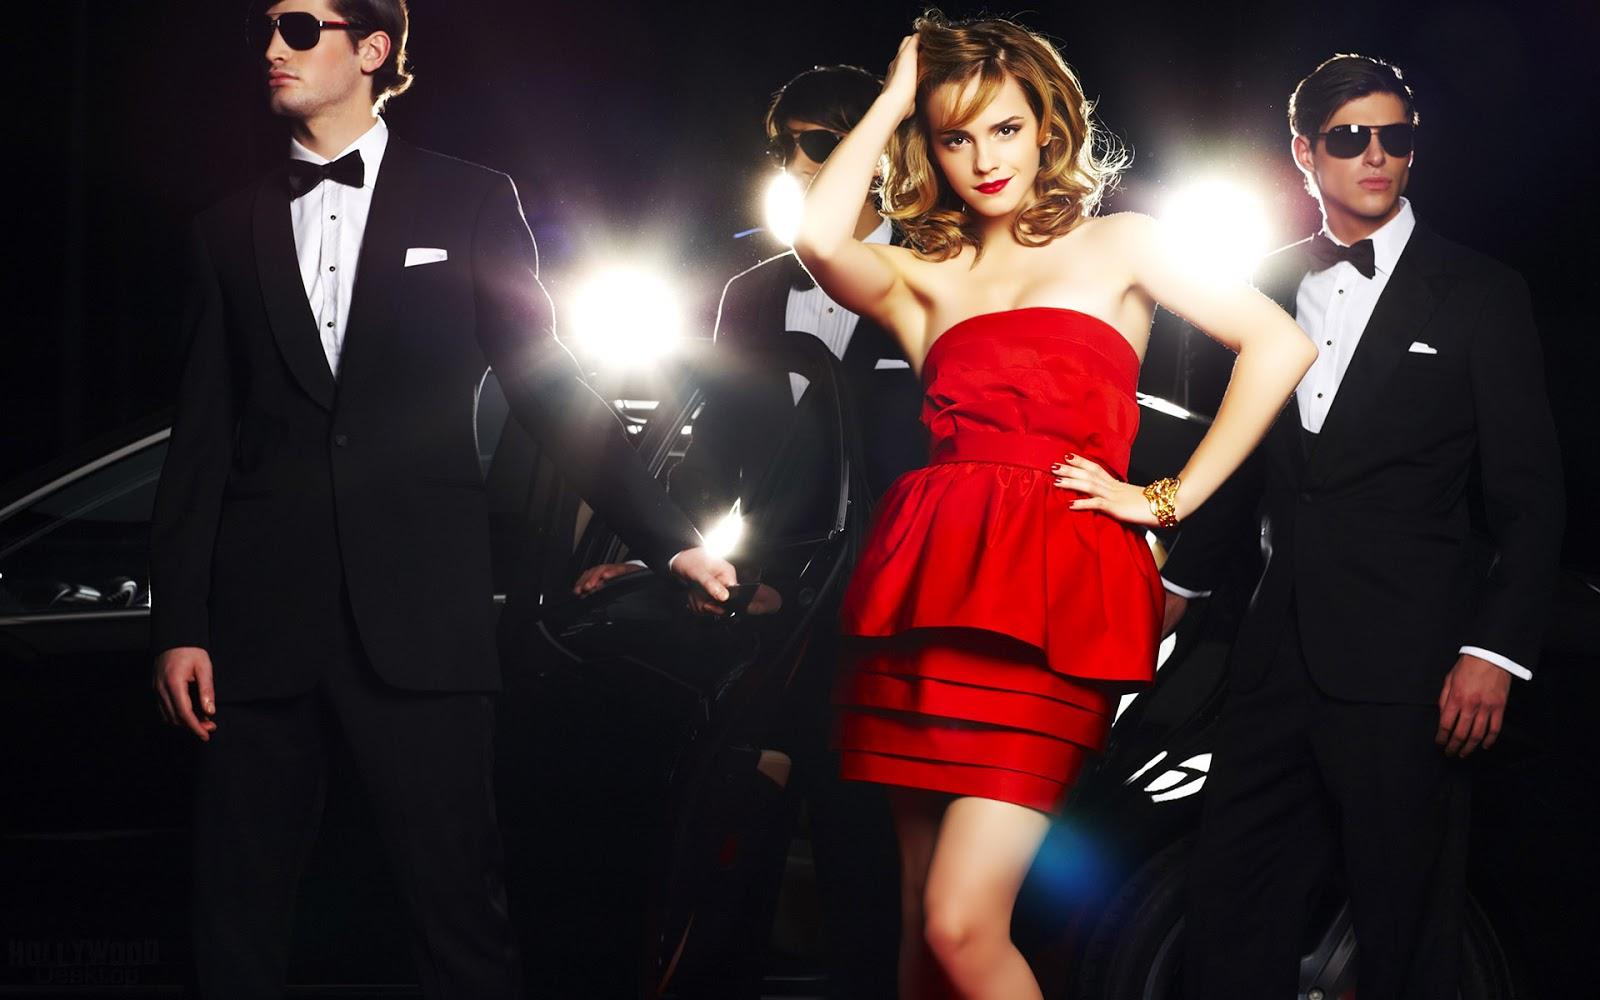 Hot Emma Watson Red Dress Wallpaper HD